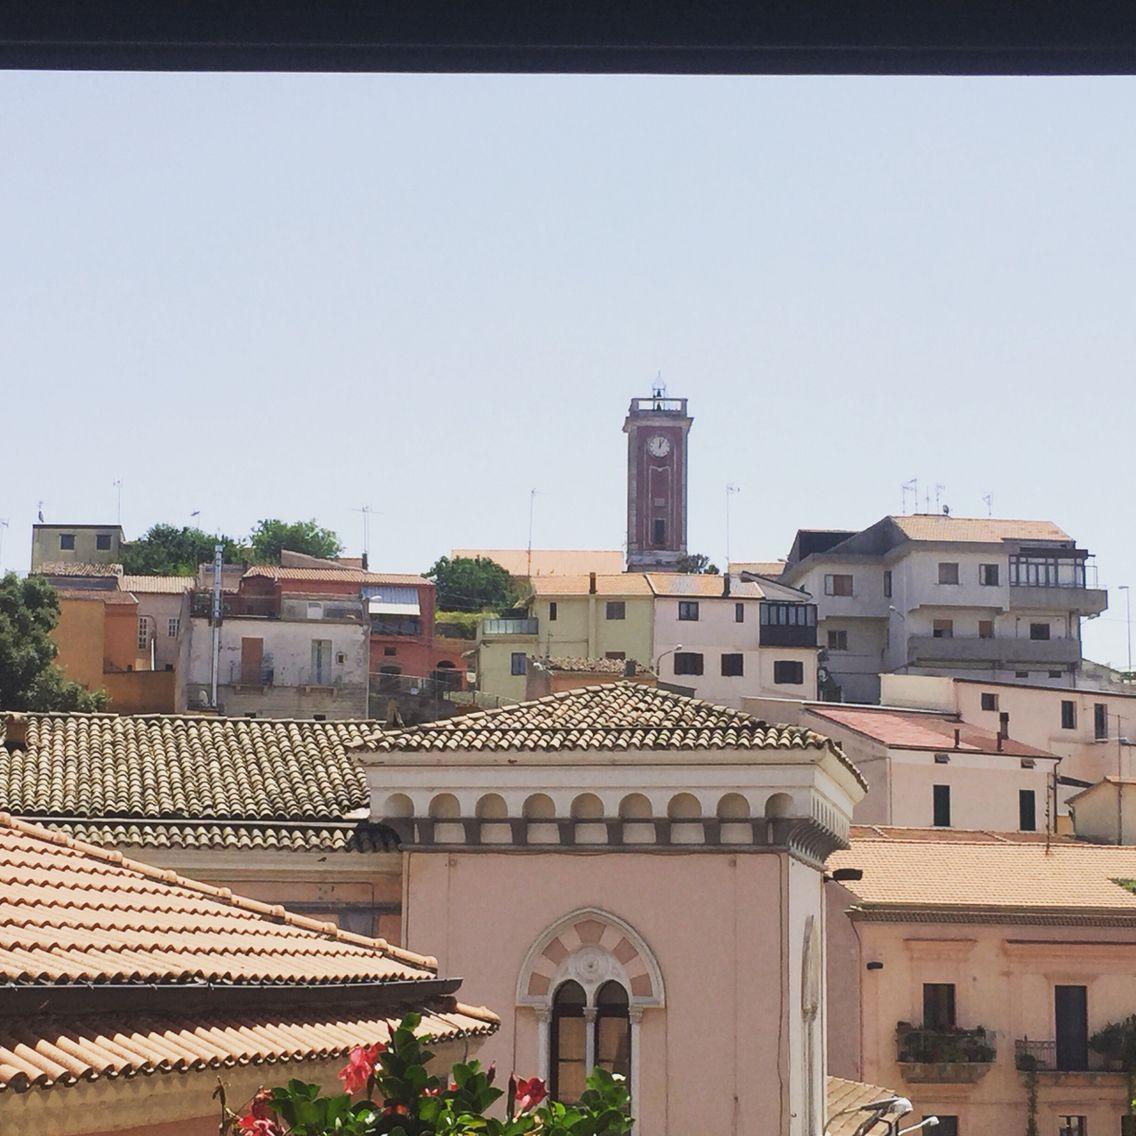 Rionero in Vulture, Basilicata Southern italy, Travel